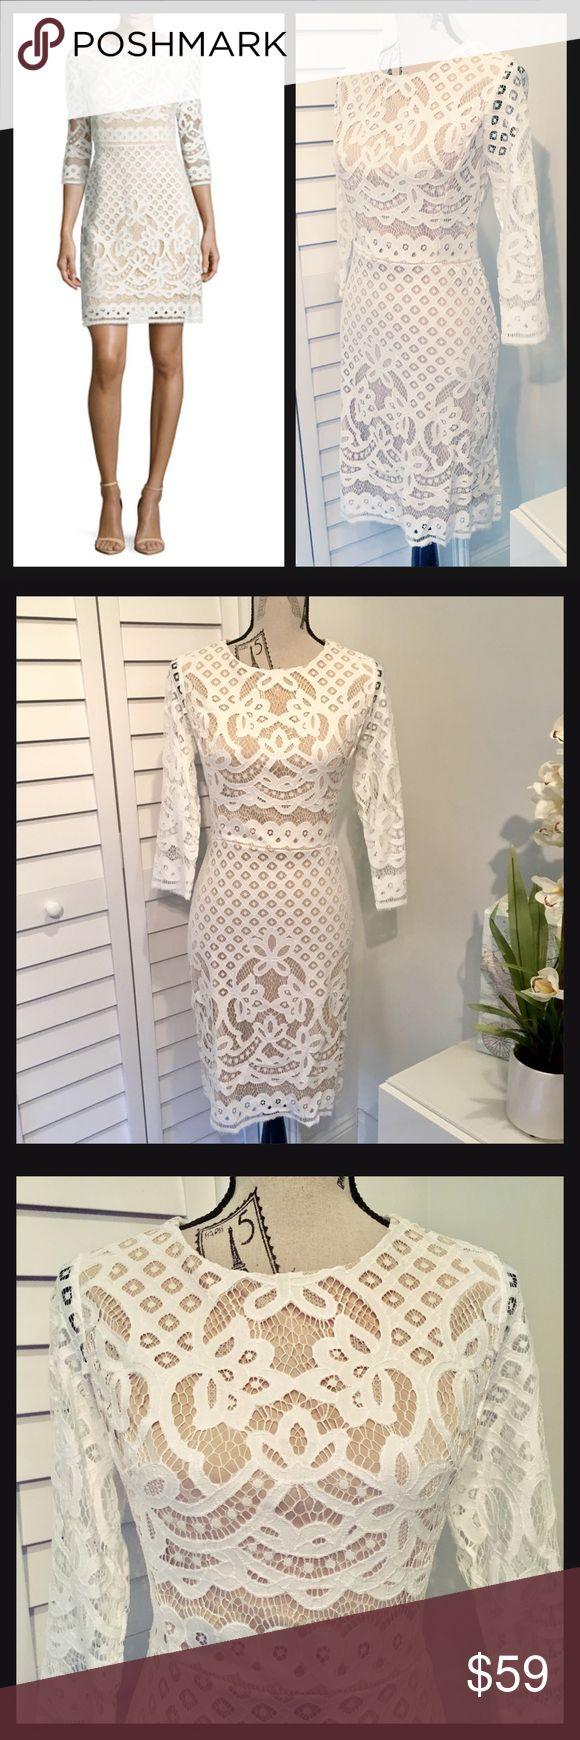 🎉Host Pick🎉 Ivory & Tan 3/4 Sleeves Lace Dress🌷 NWT Gorgeous Ivory & Tan 3/4 Sleeves Lace Mini Dress 🌷 Dresses Mini